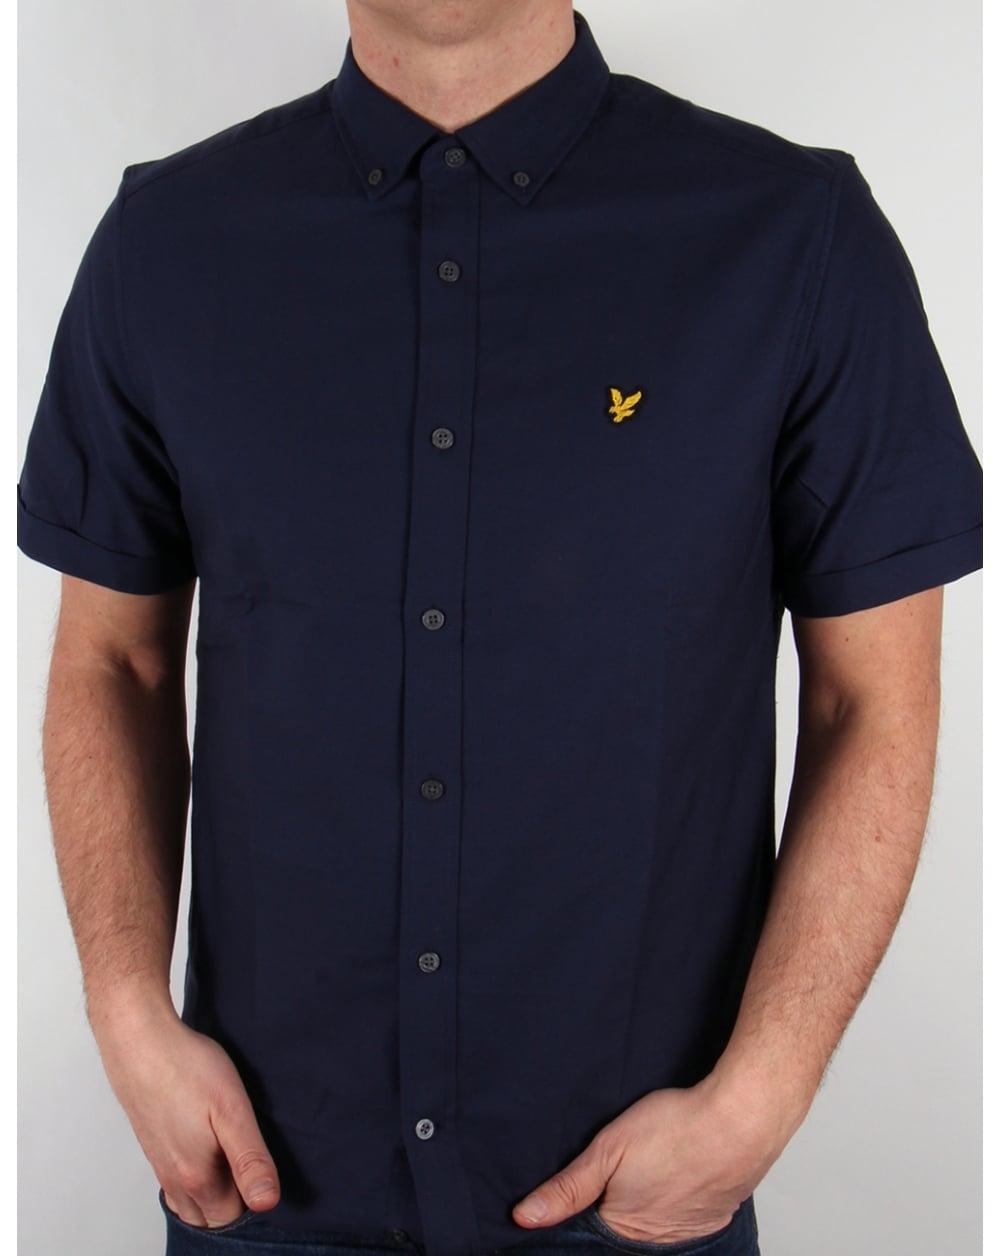 Lyle And Scott Short Sleeve Oxford Shirt Navy Mens Cotton